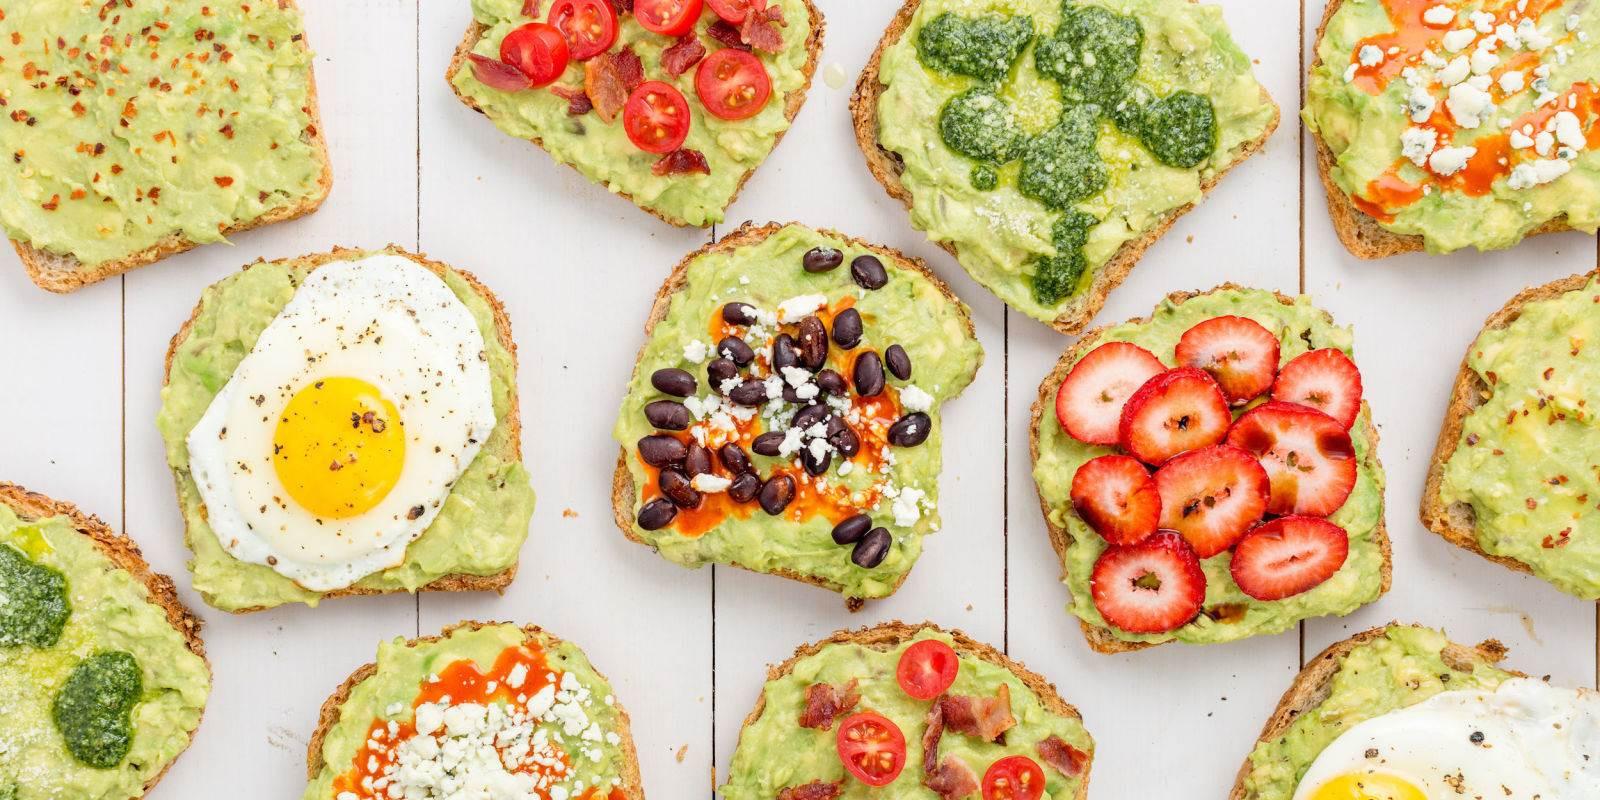 Tasty Healthy Snacks  5 Tasty And Healthy Study Snacks